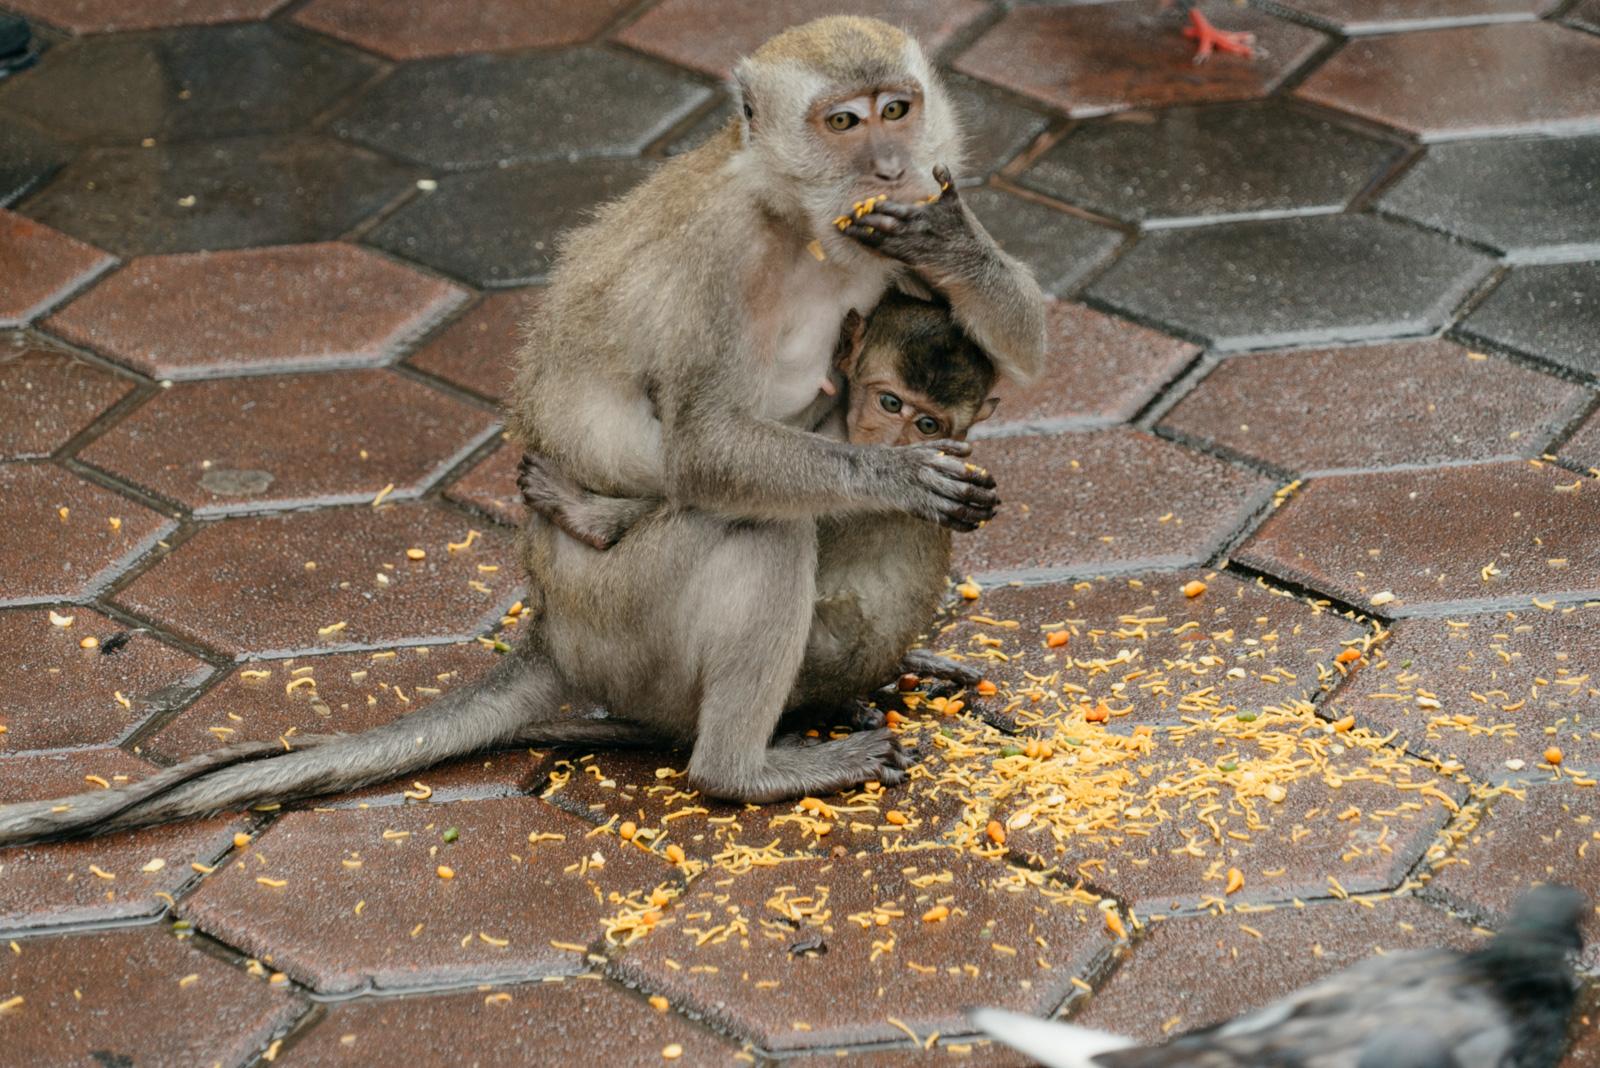 Kuala Lumpur's monkeys